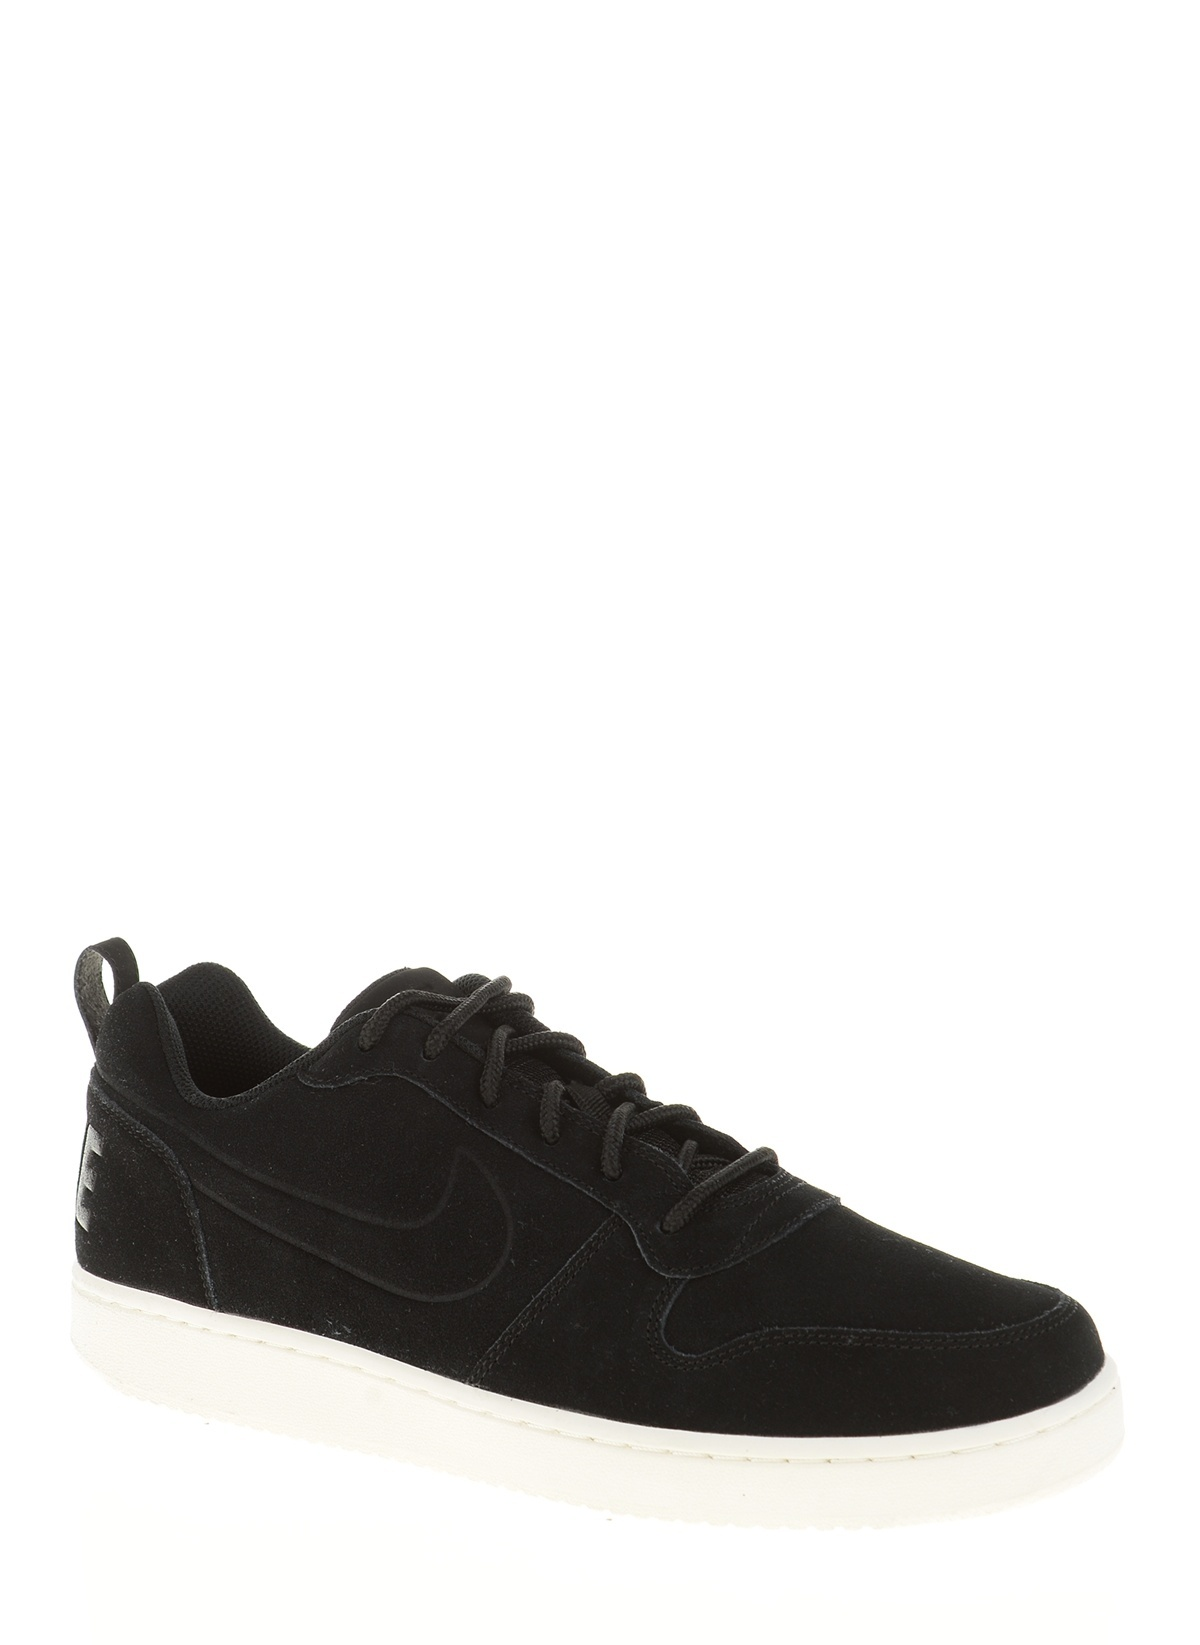 5ec55750a7 Nike Erkek Nike Court Borough Low Prem Black Black-Sail